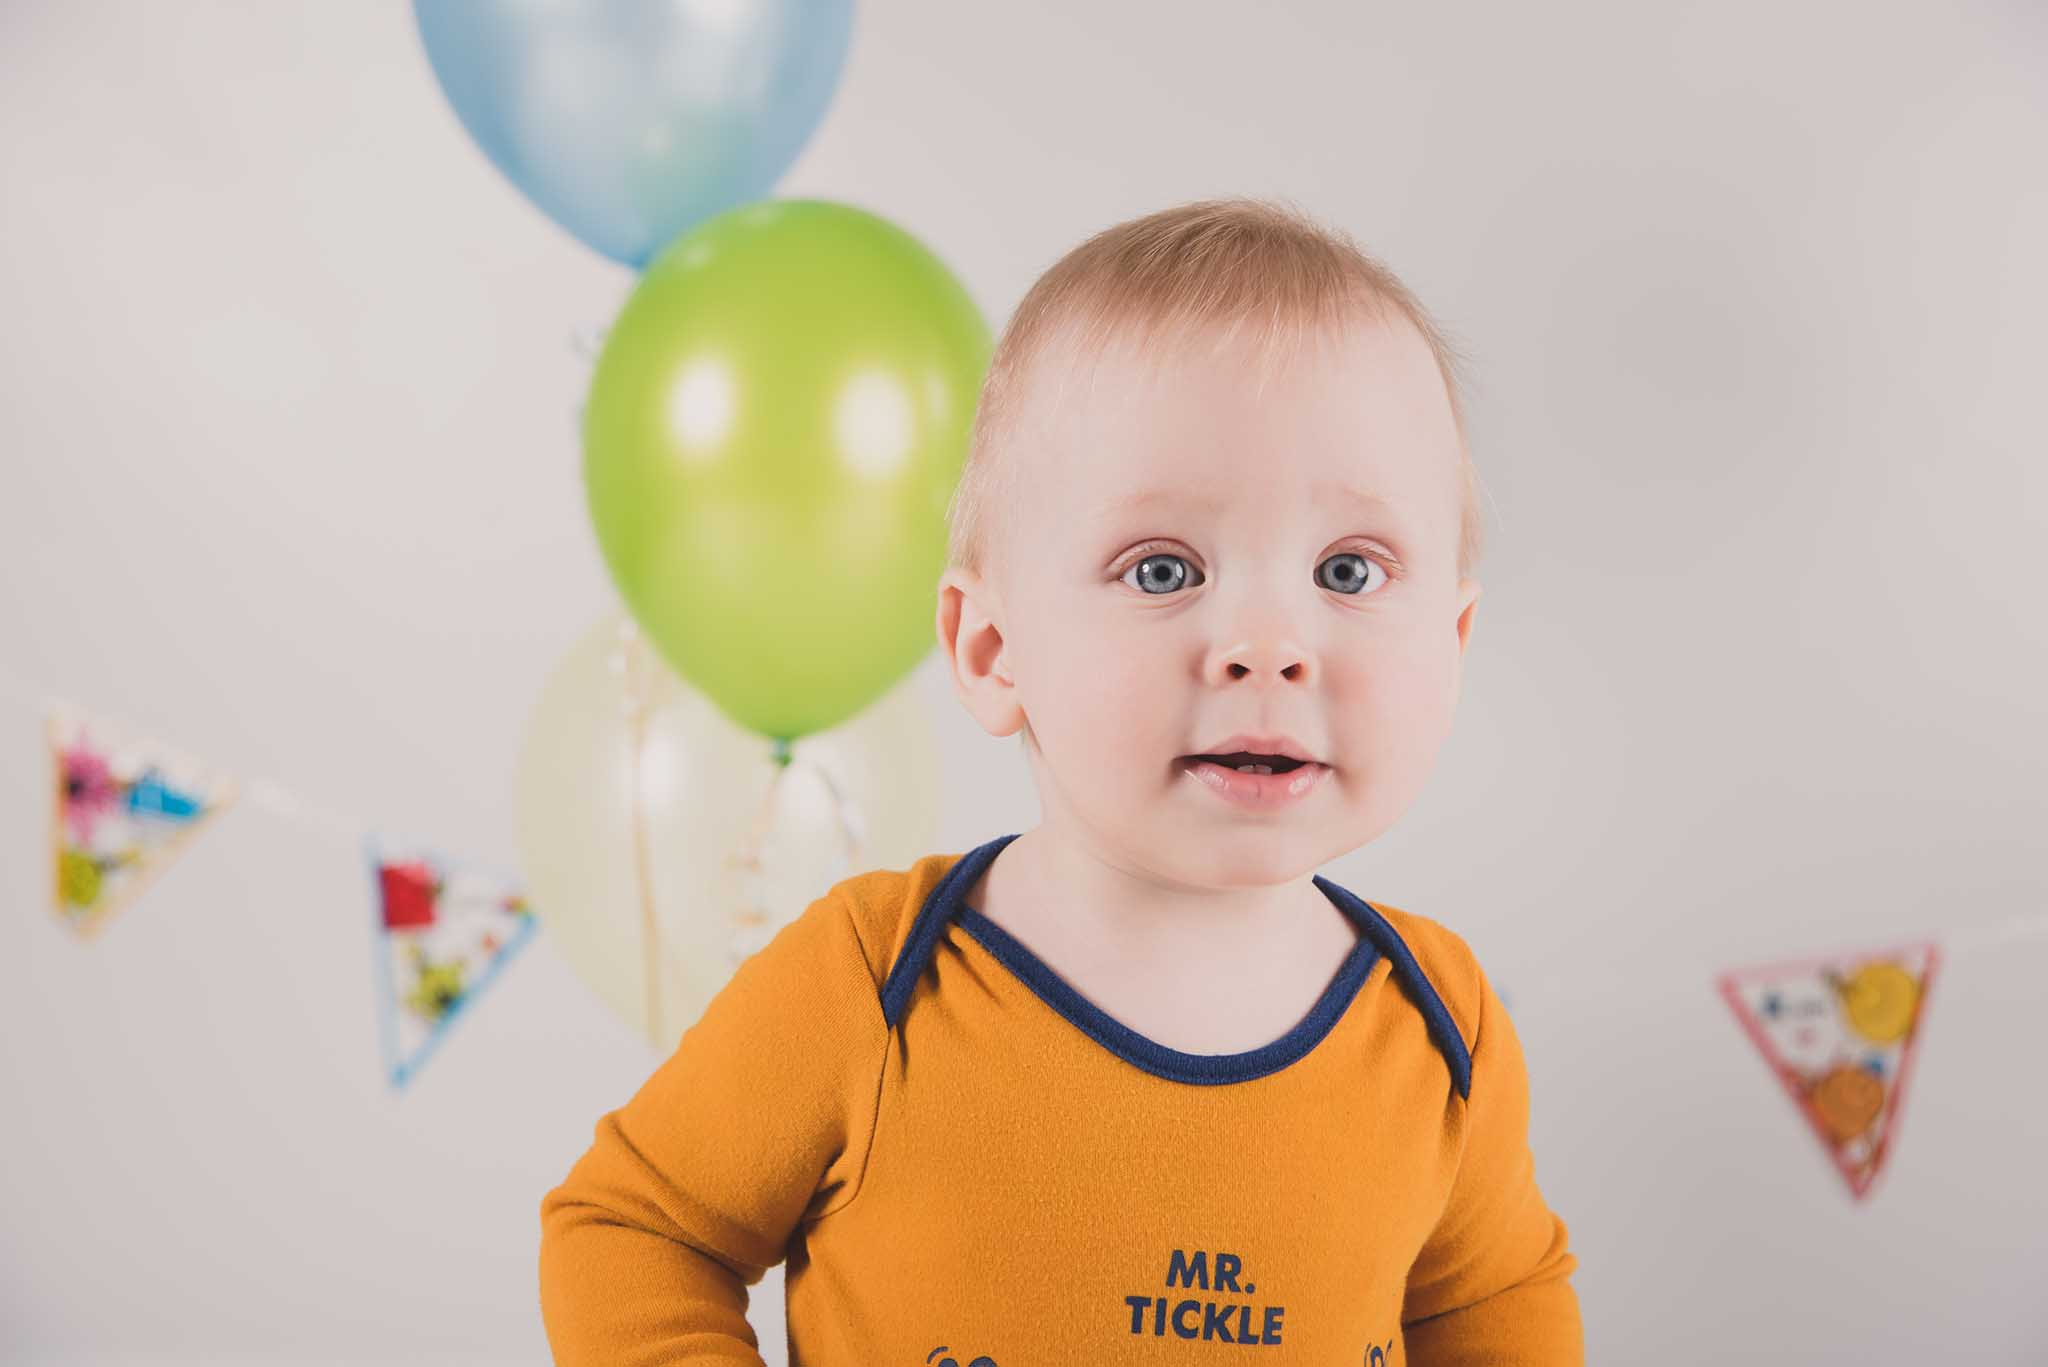 5 Fun Ideas to Celebrate Baby's 1st Birthday